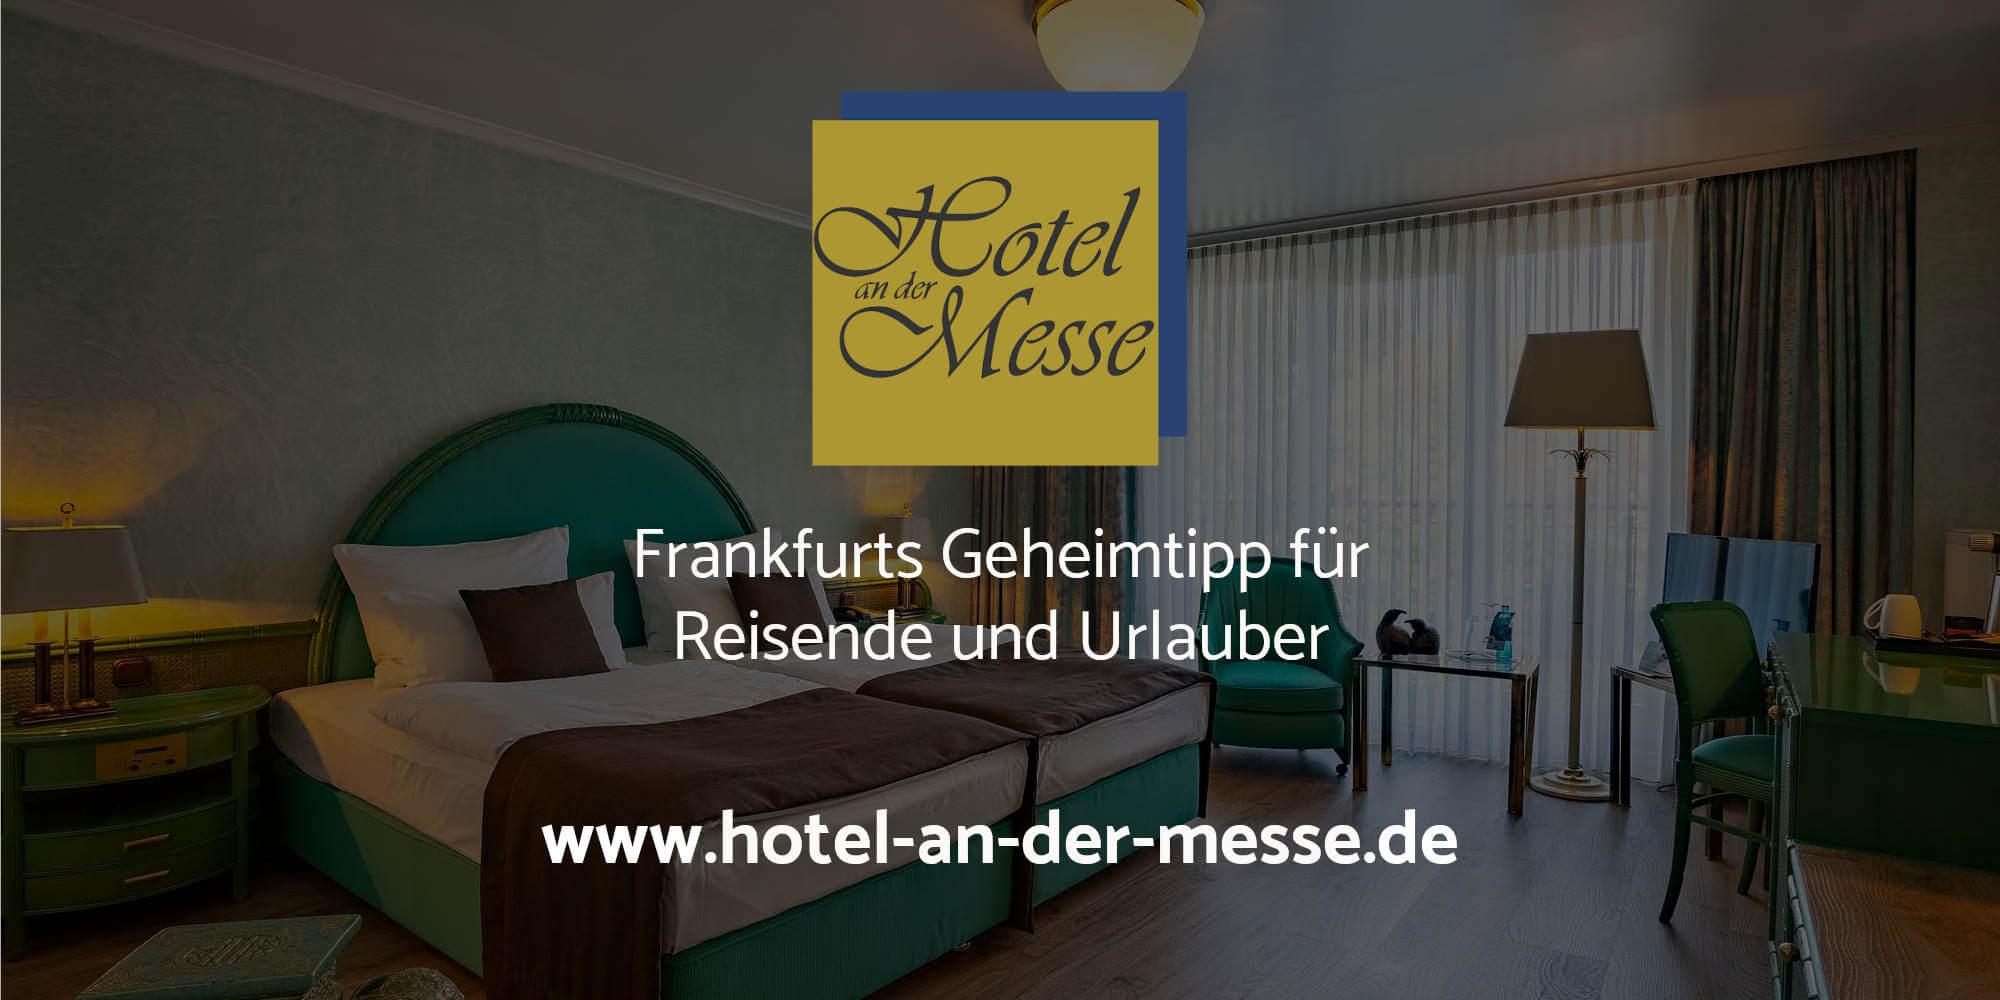 OpenGraph: Twitter | Villa Westend Hotel an der Messe | Frankfurt's insider tip · Business · Leisure